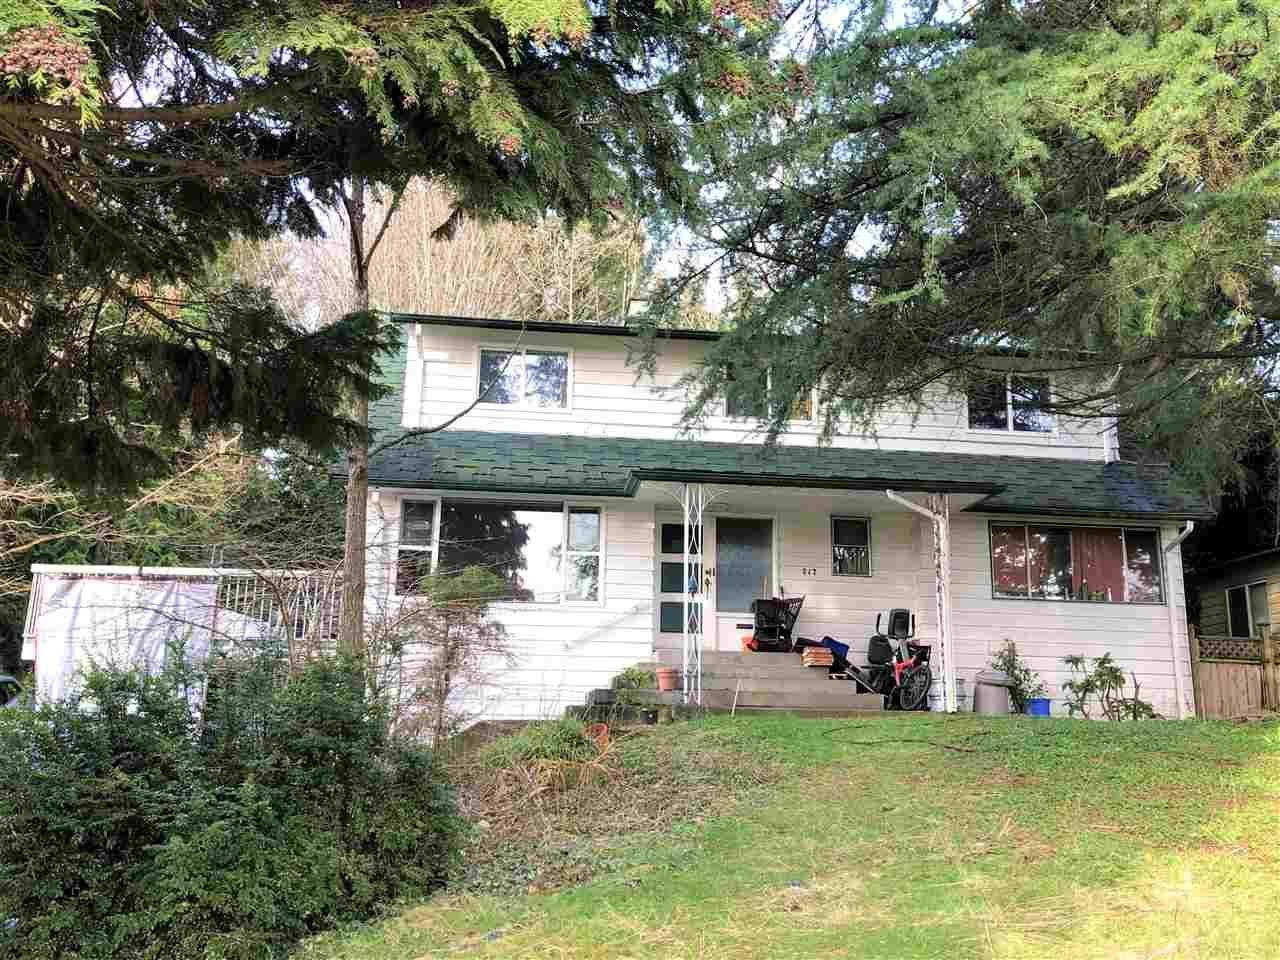 Main Photo: 717 EDGAR Avenue in Coquitlam: Coquitlam West House for sale : MLS®# R2535129